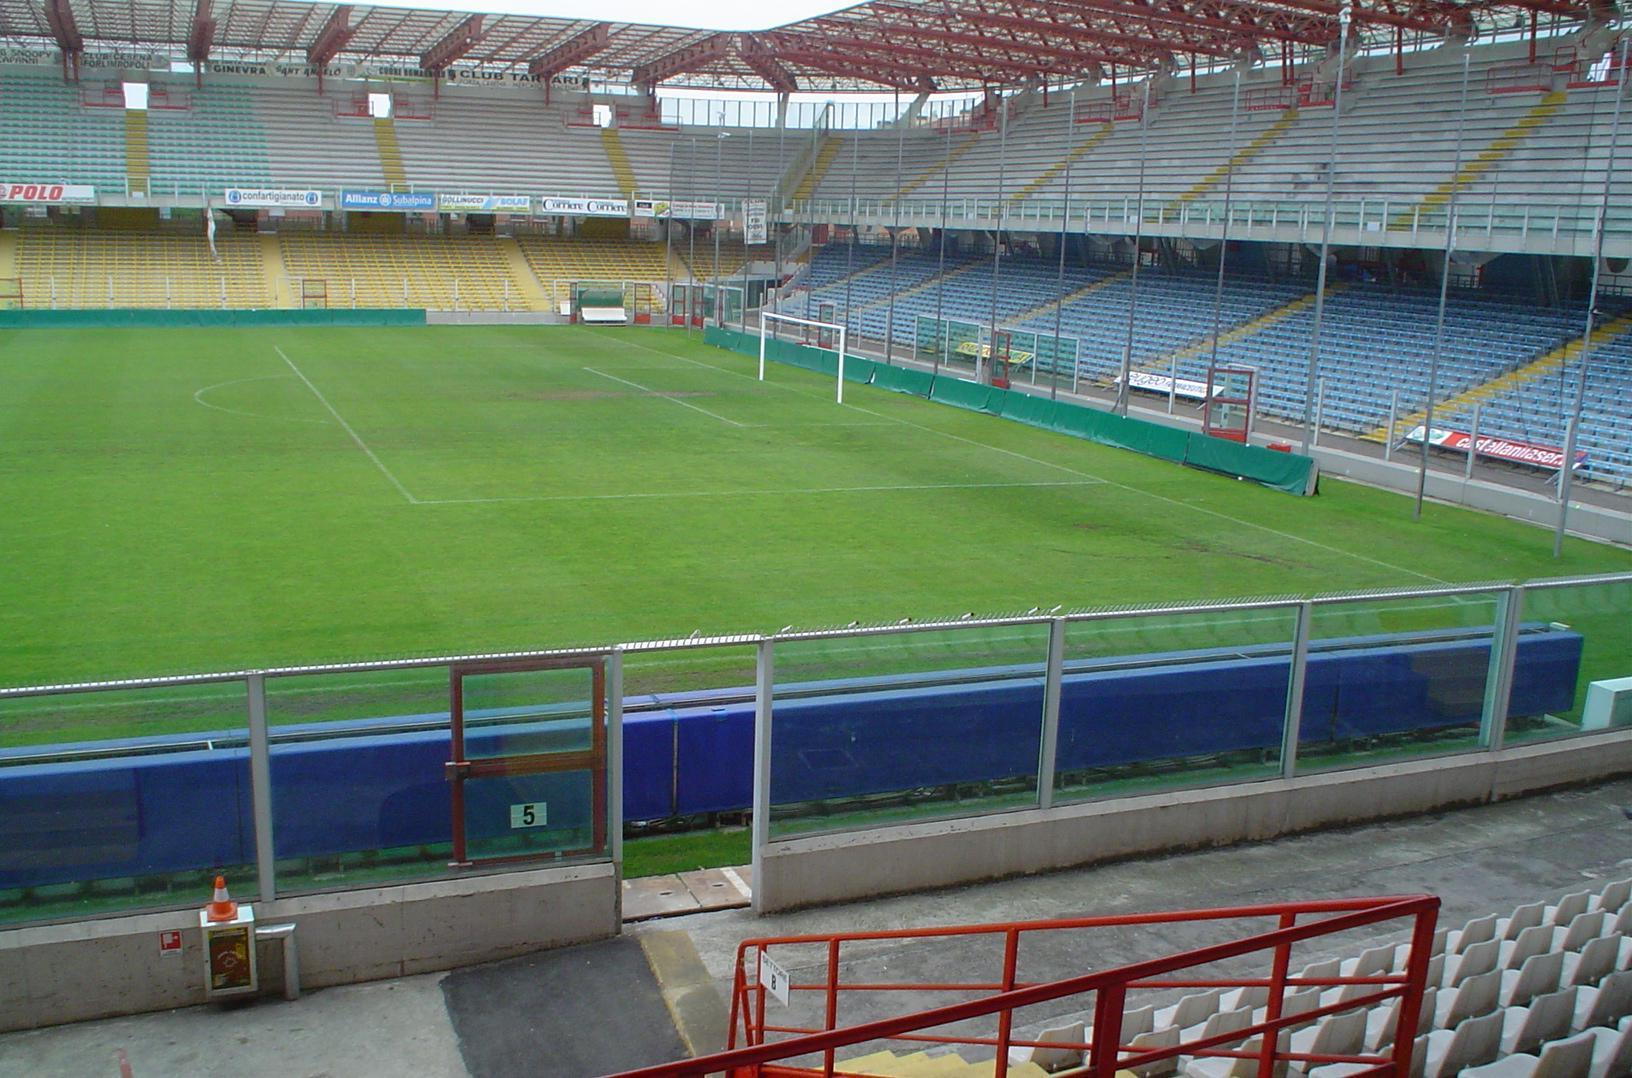 Serie A, Cesena: Novità stadio Manuzzi